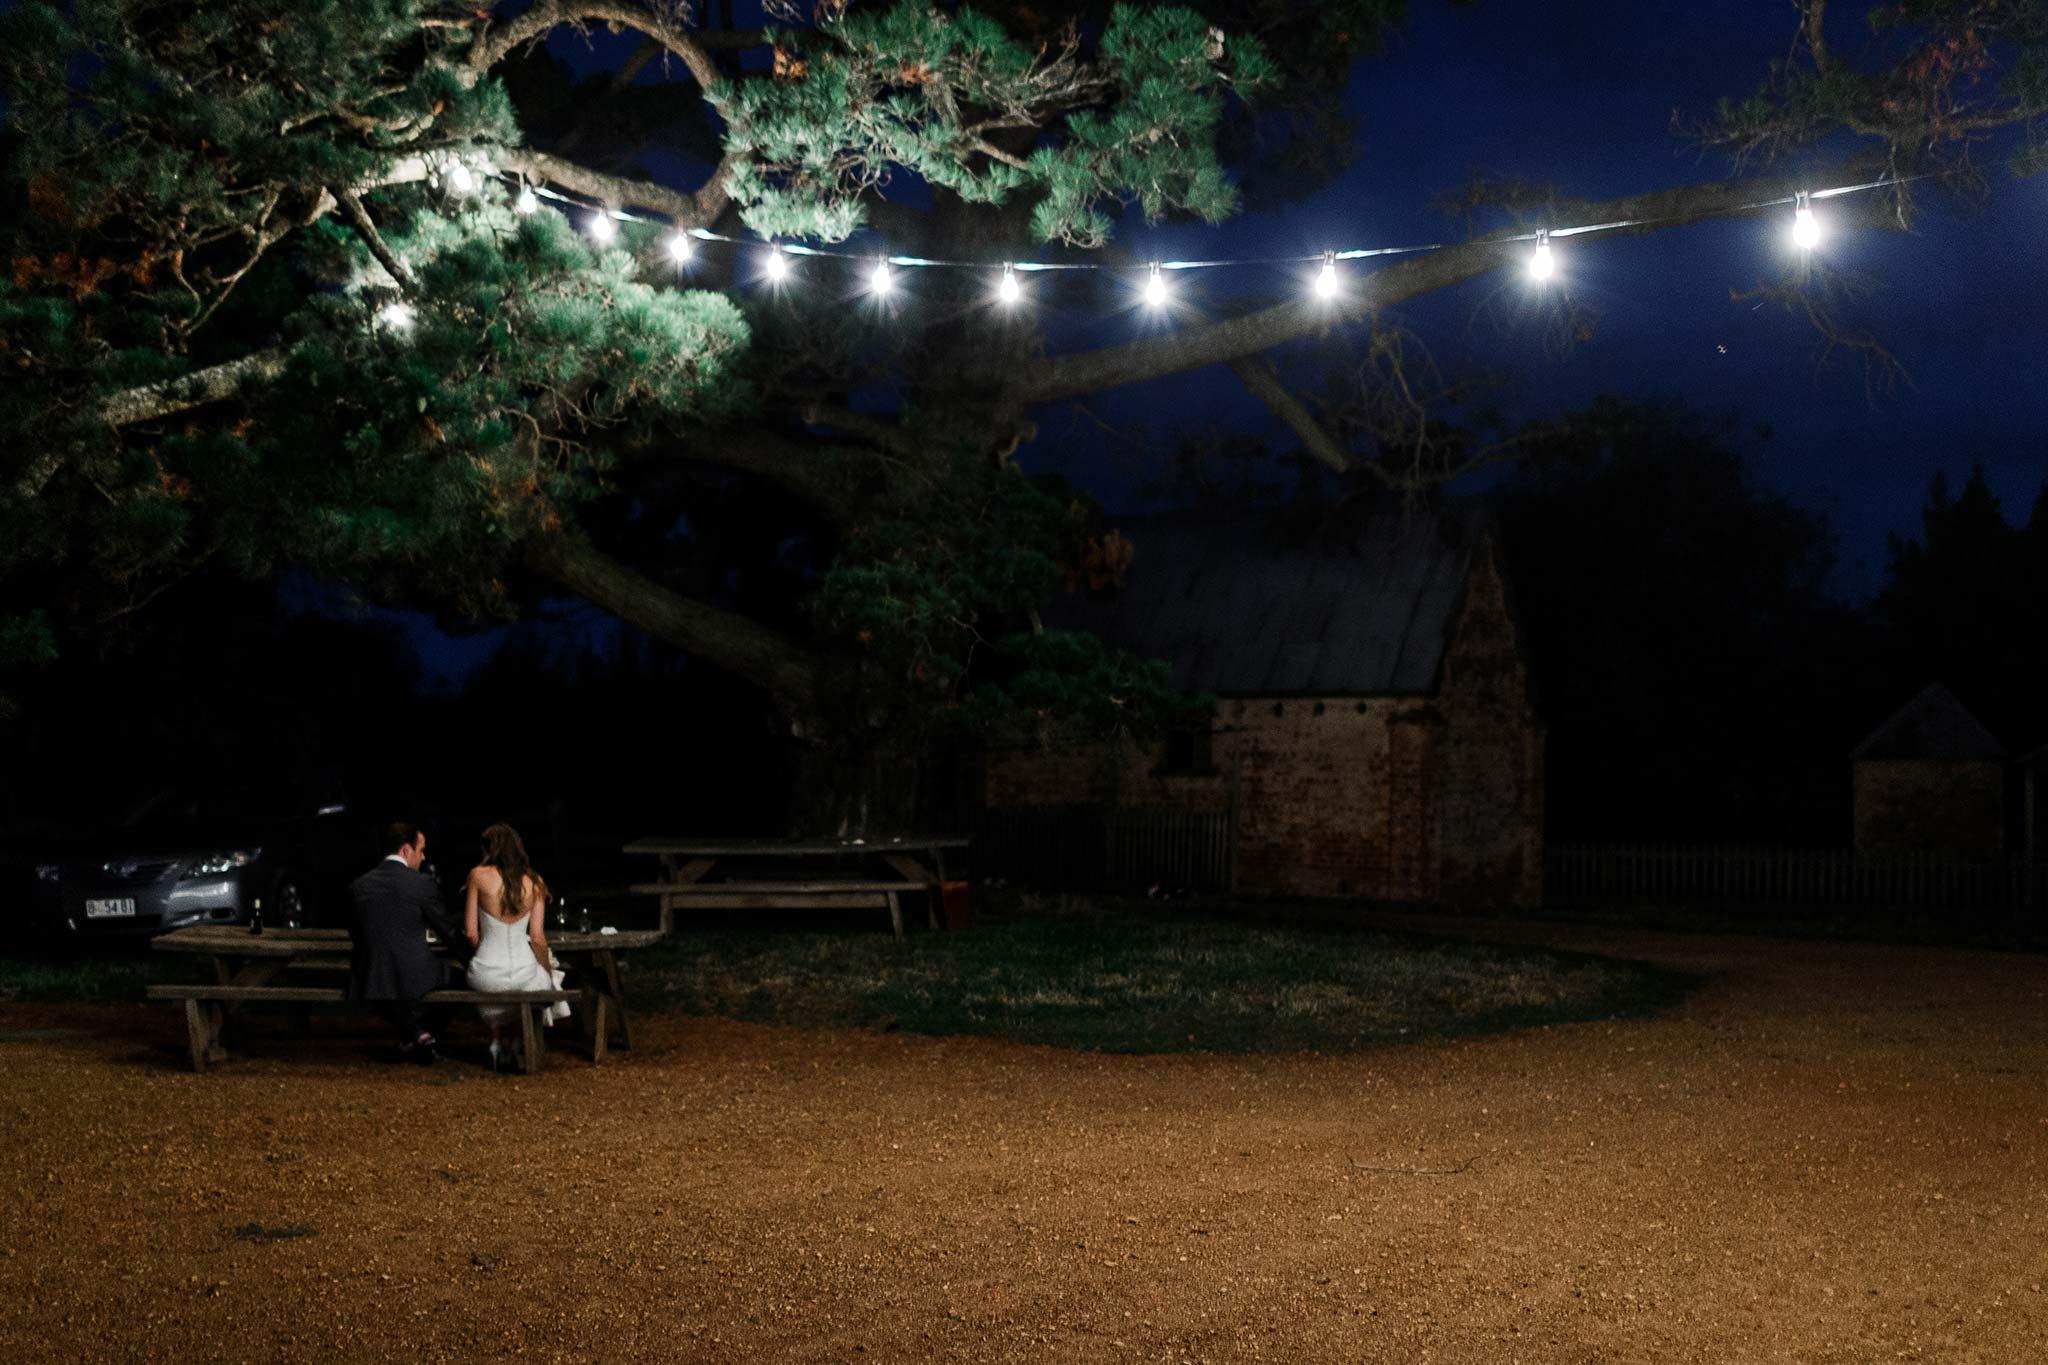 Launceston-Brickendon-barn-Wedding-Photographer-reception-bride-groom-alone